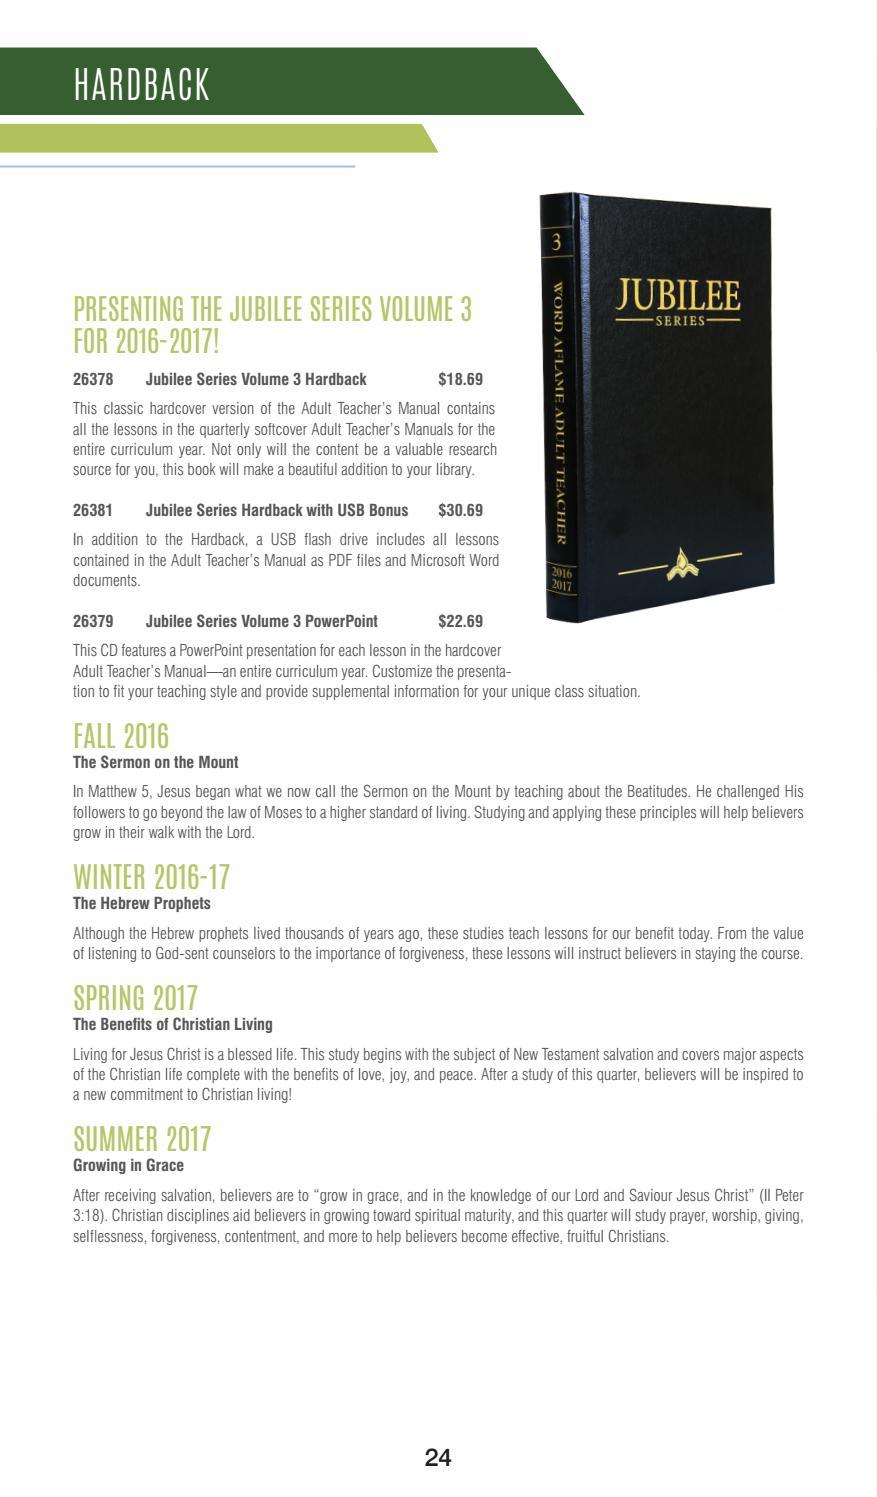 Pentecostal Publishing House Winter 2016-17 Catalog by Pentecostal